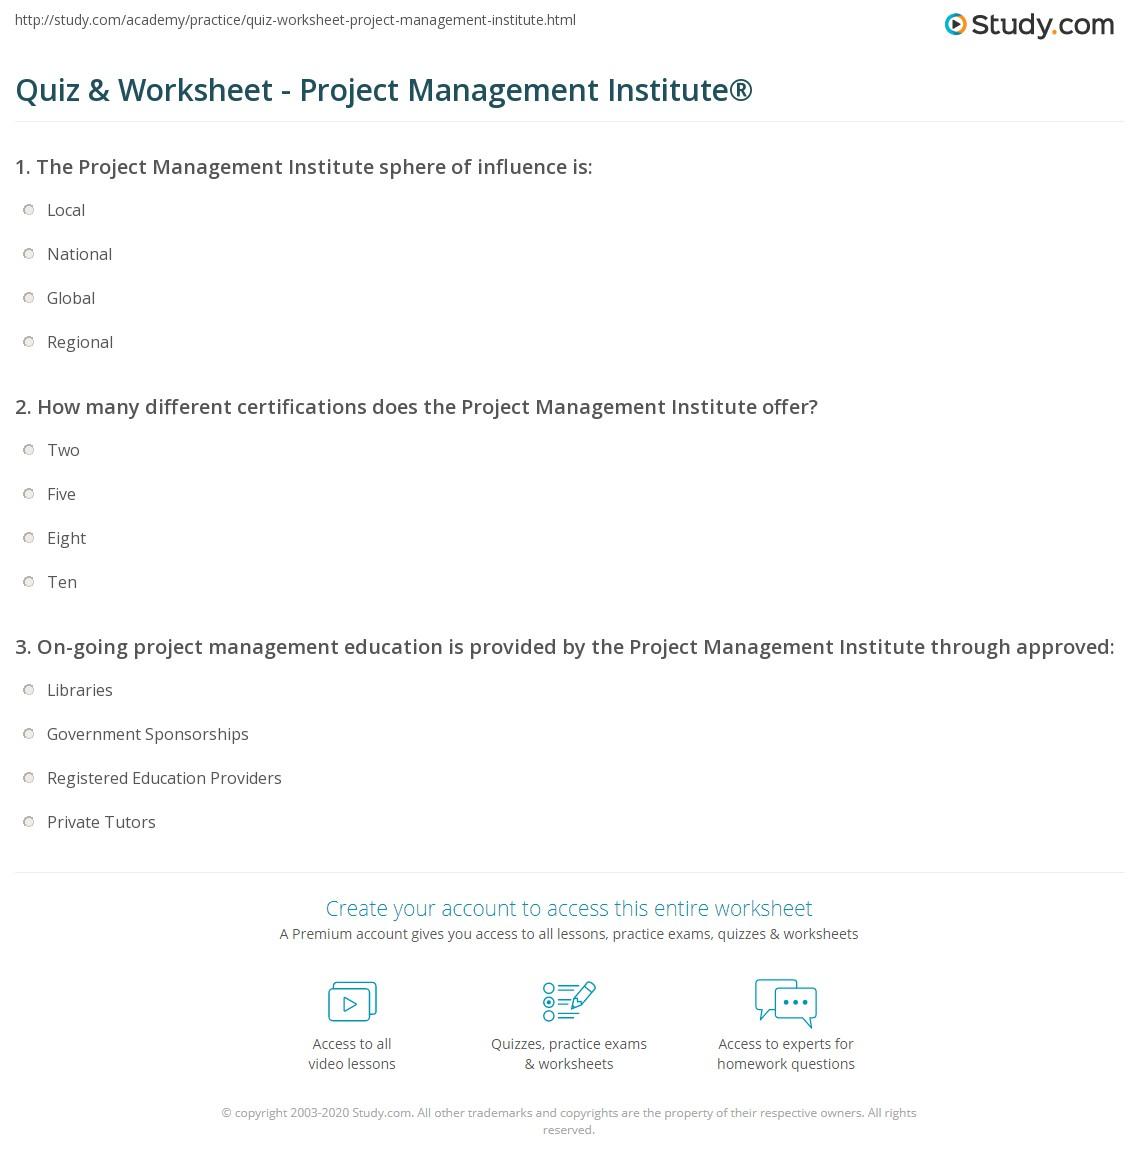 Quiz Worksheet Project Management Institute Study